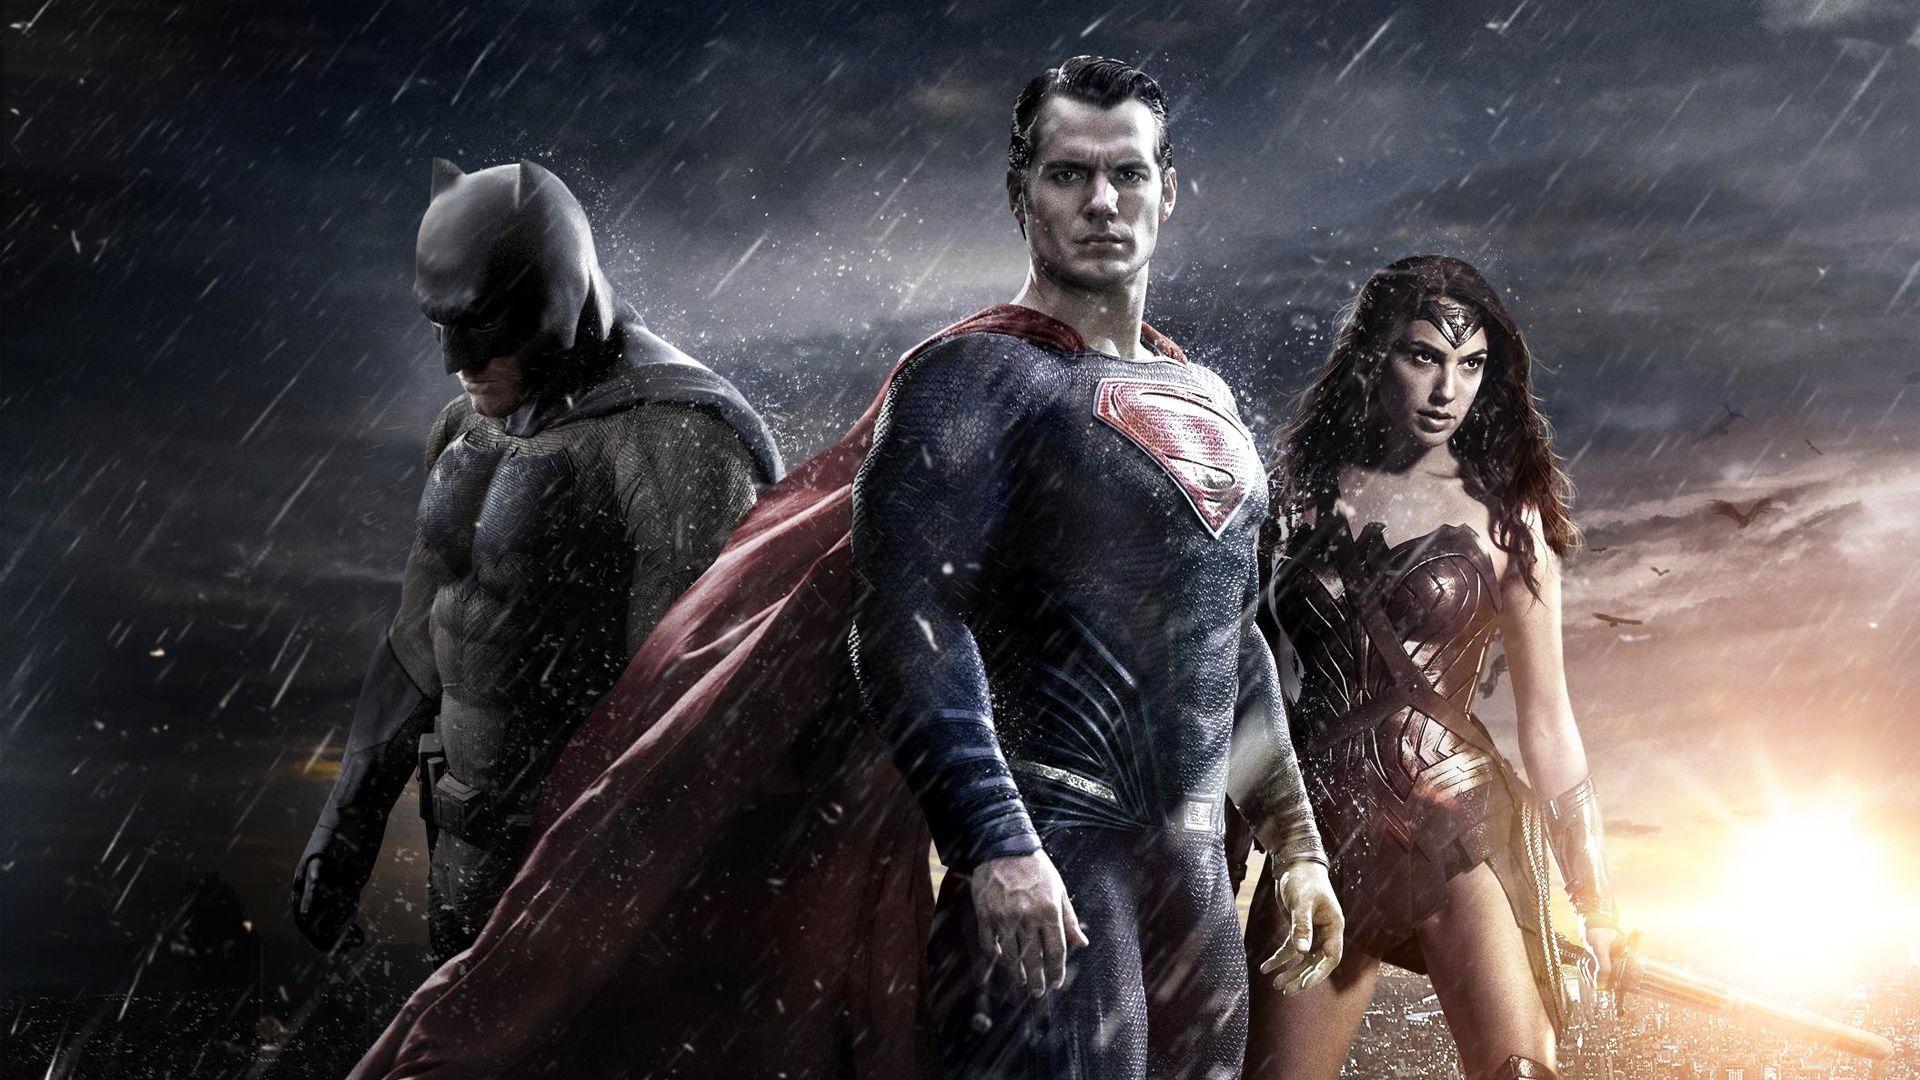 Batman vs Superman movie wallpaper